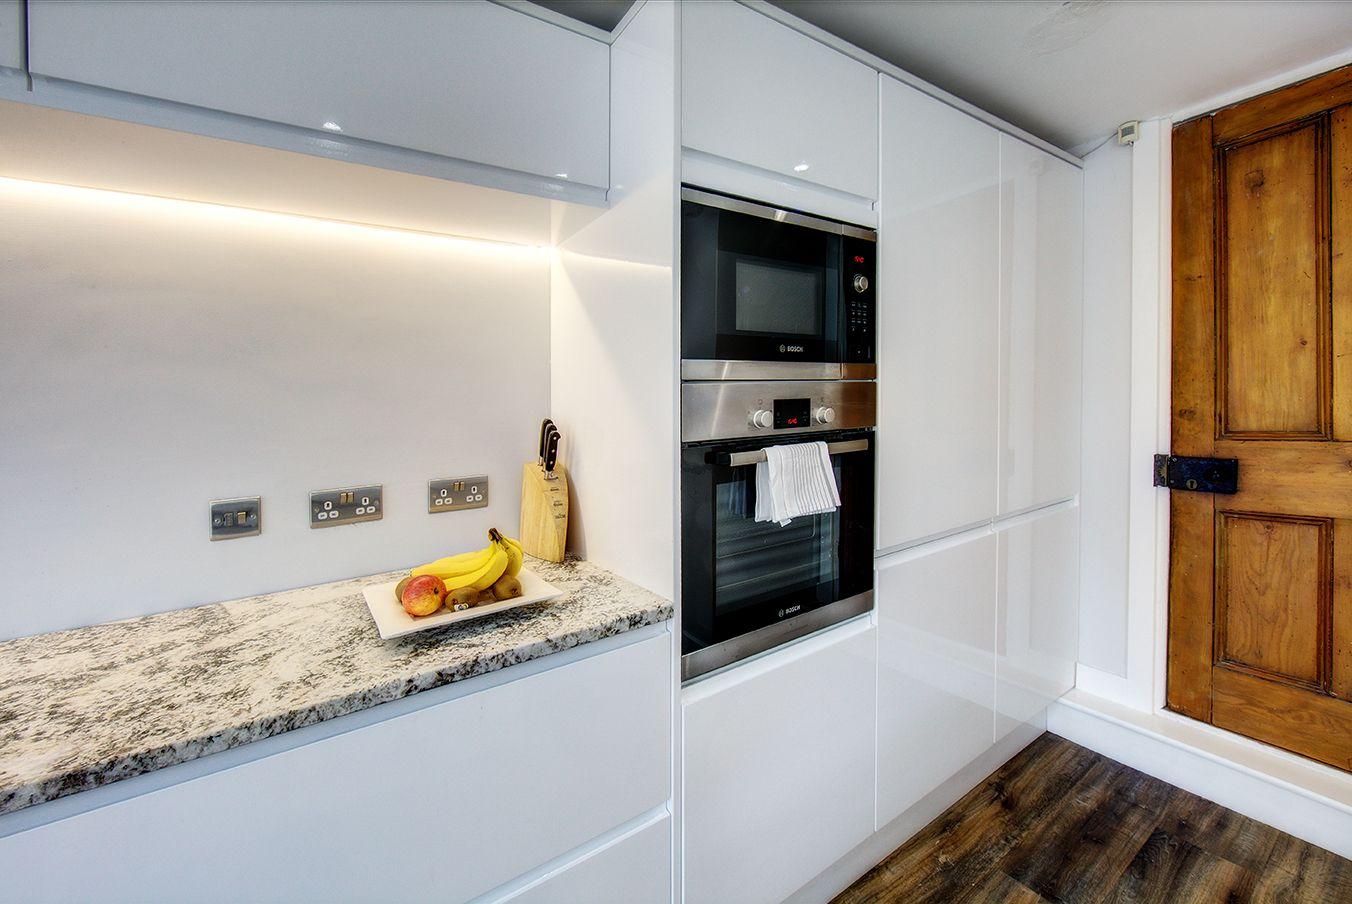 Delicieux Bulldog Kitchens | Kitchen Designer Newcastle | Kitchen Designer North East  | Bespoke Kitchen Design Newcastle